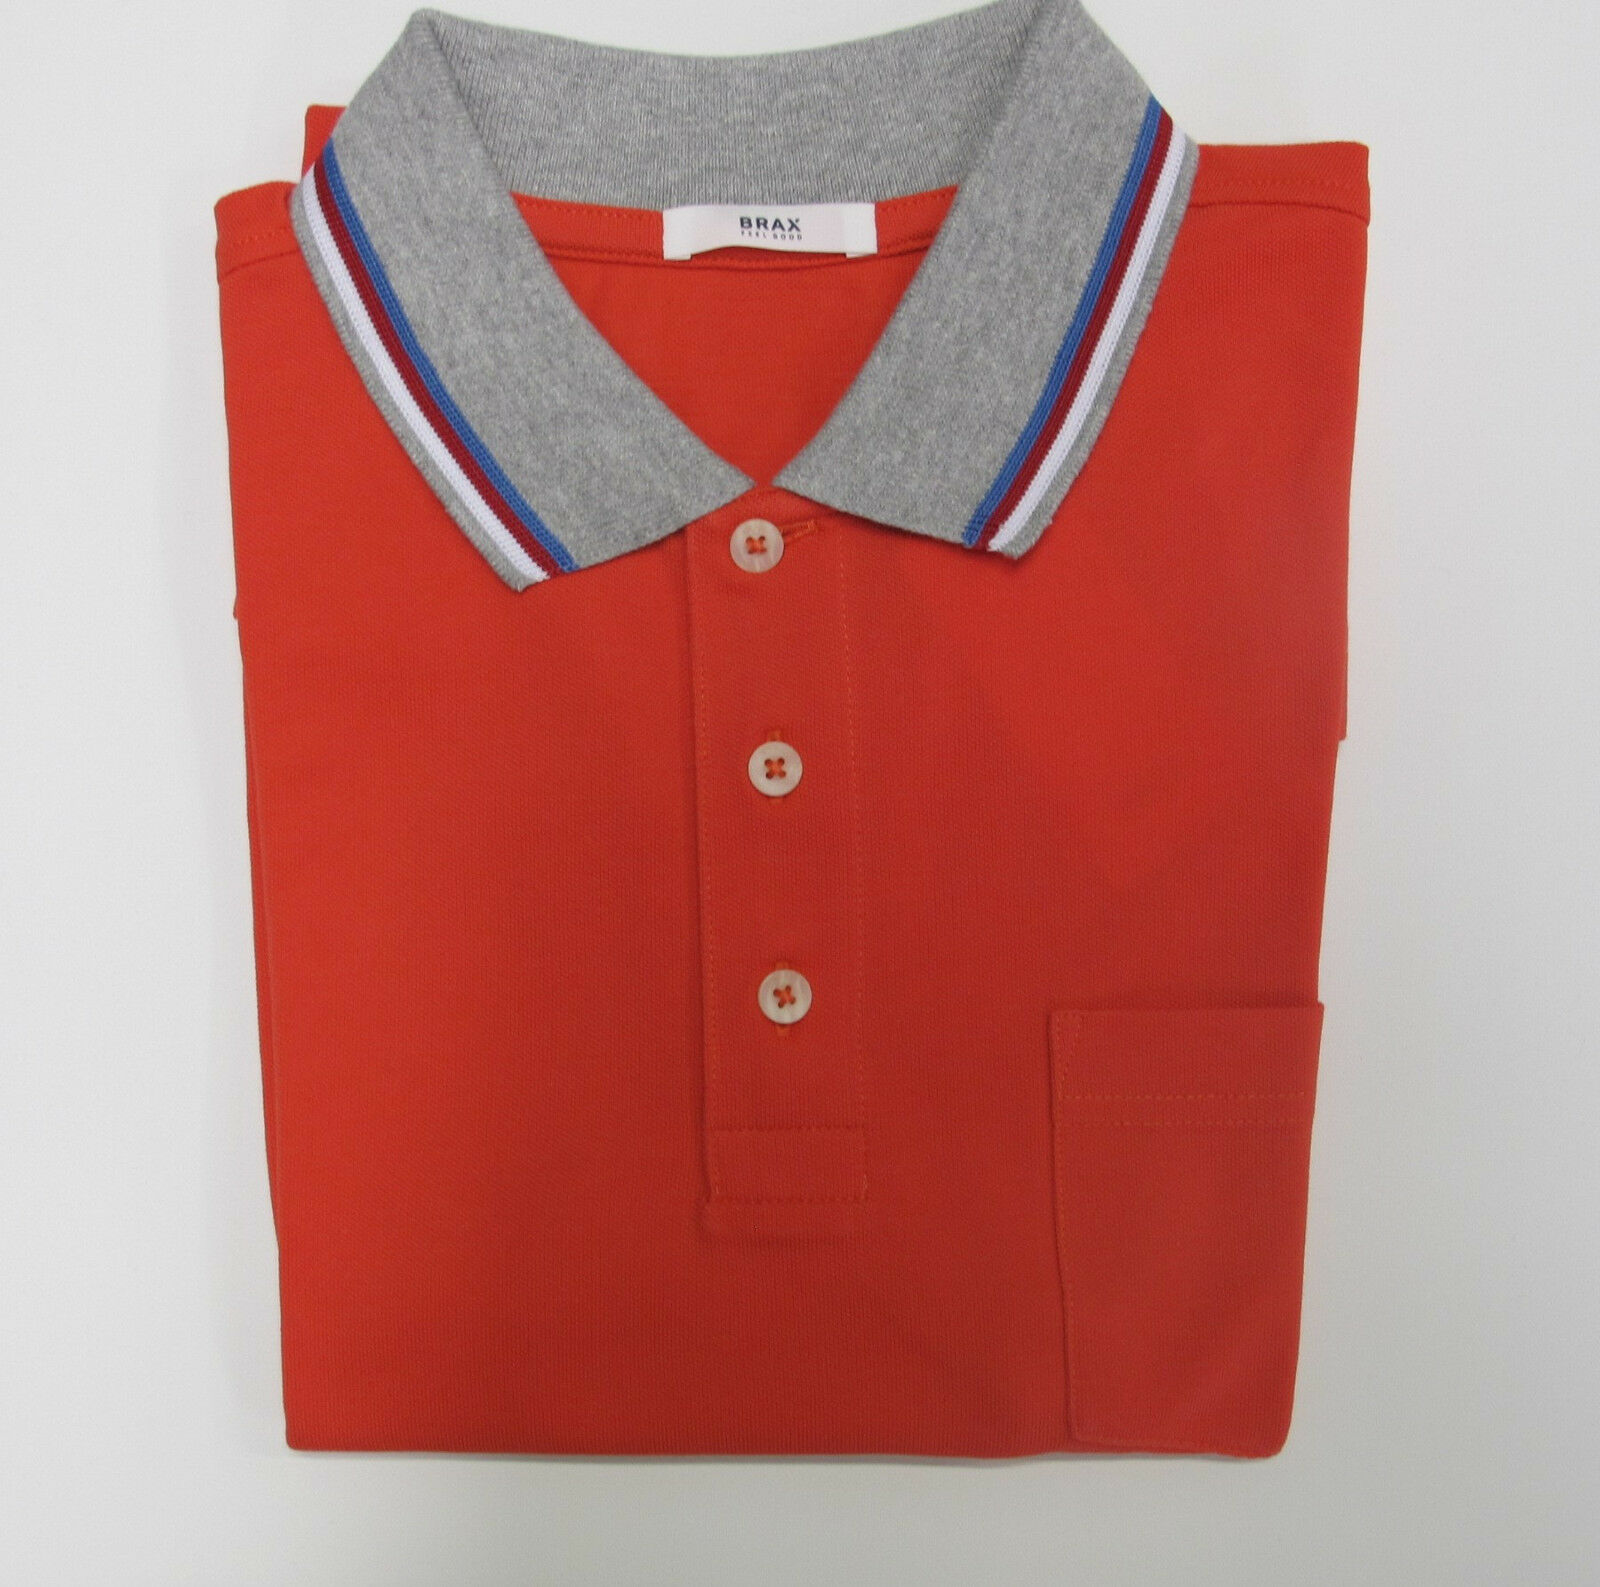 Brax Polo Shirt Kurzarm Gr. M, L, XL,XXL Rot